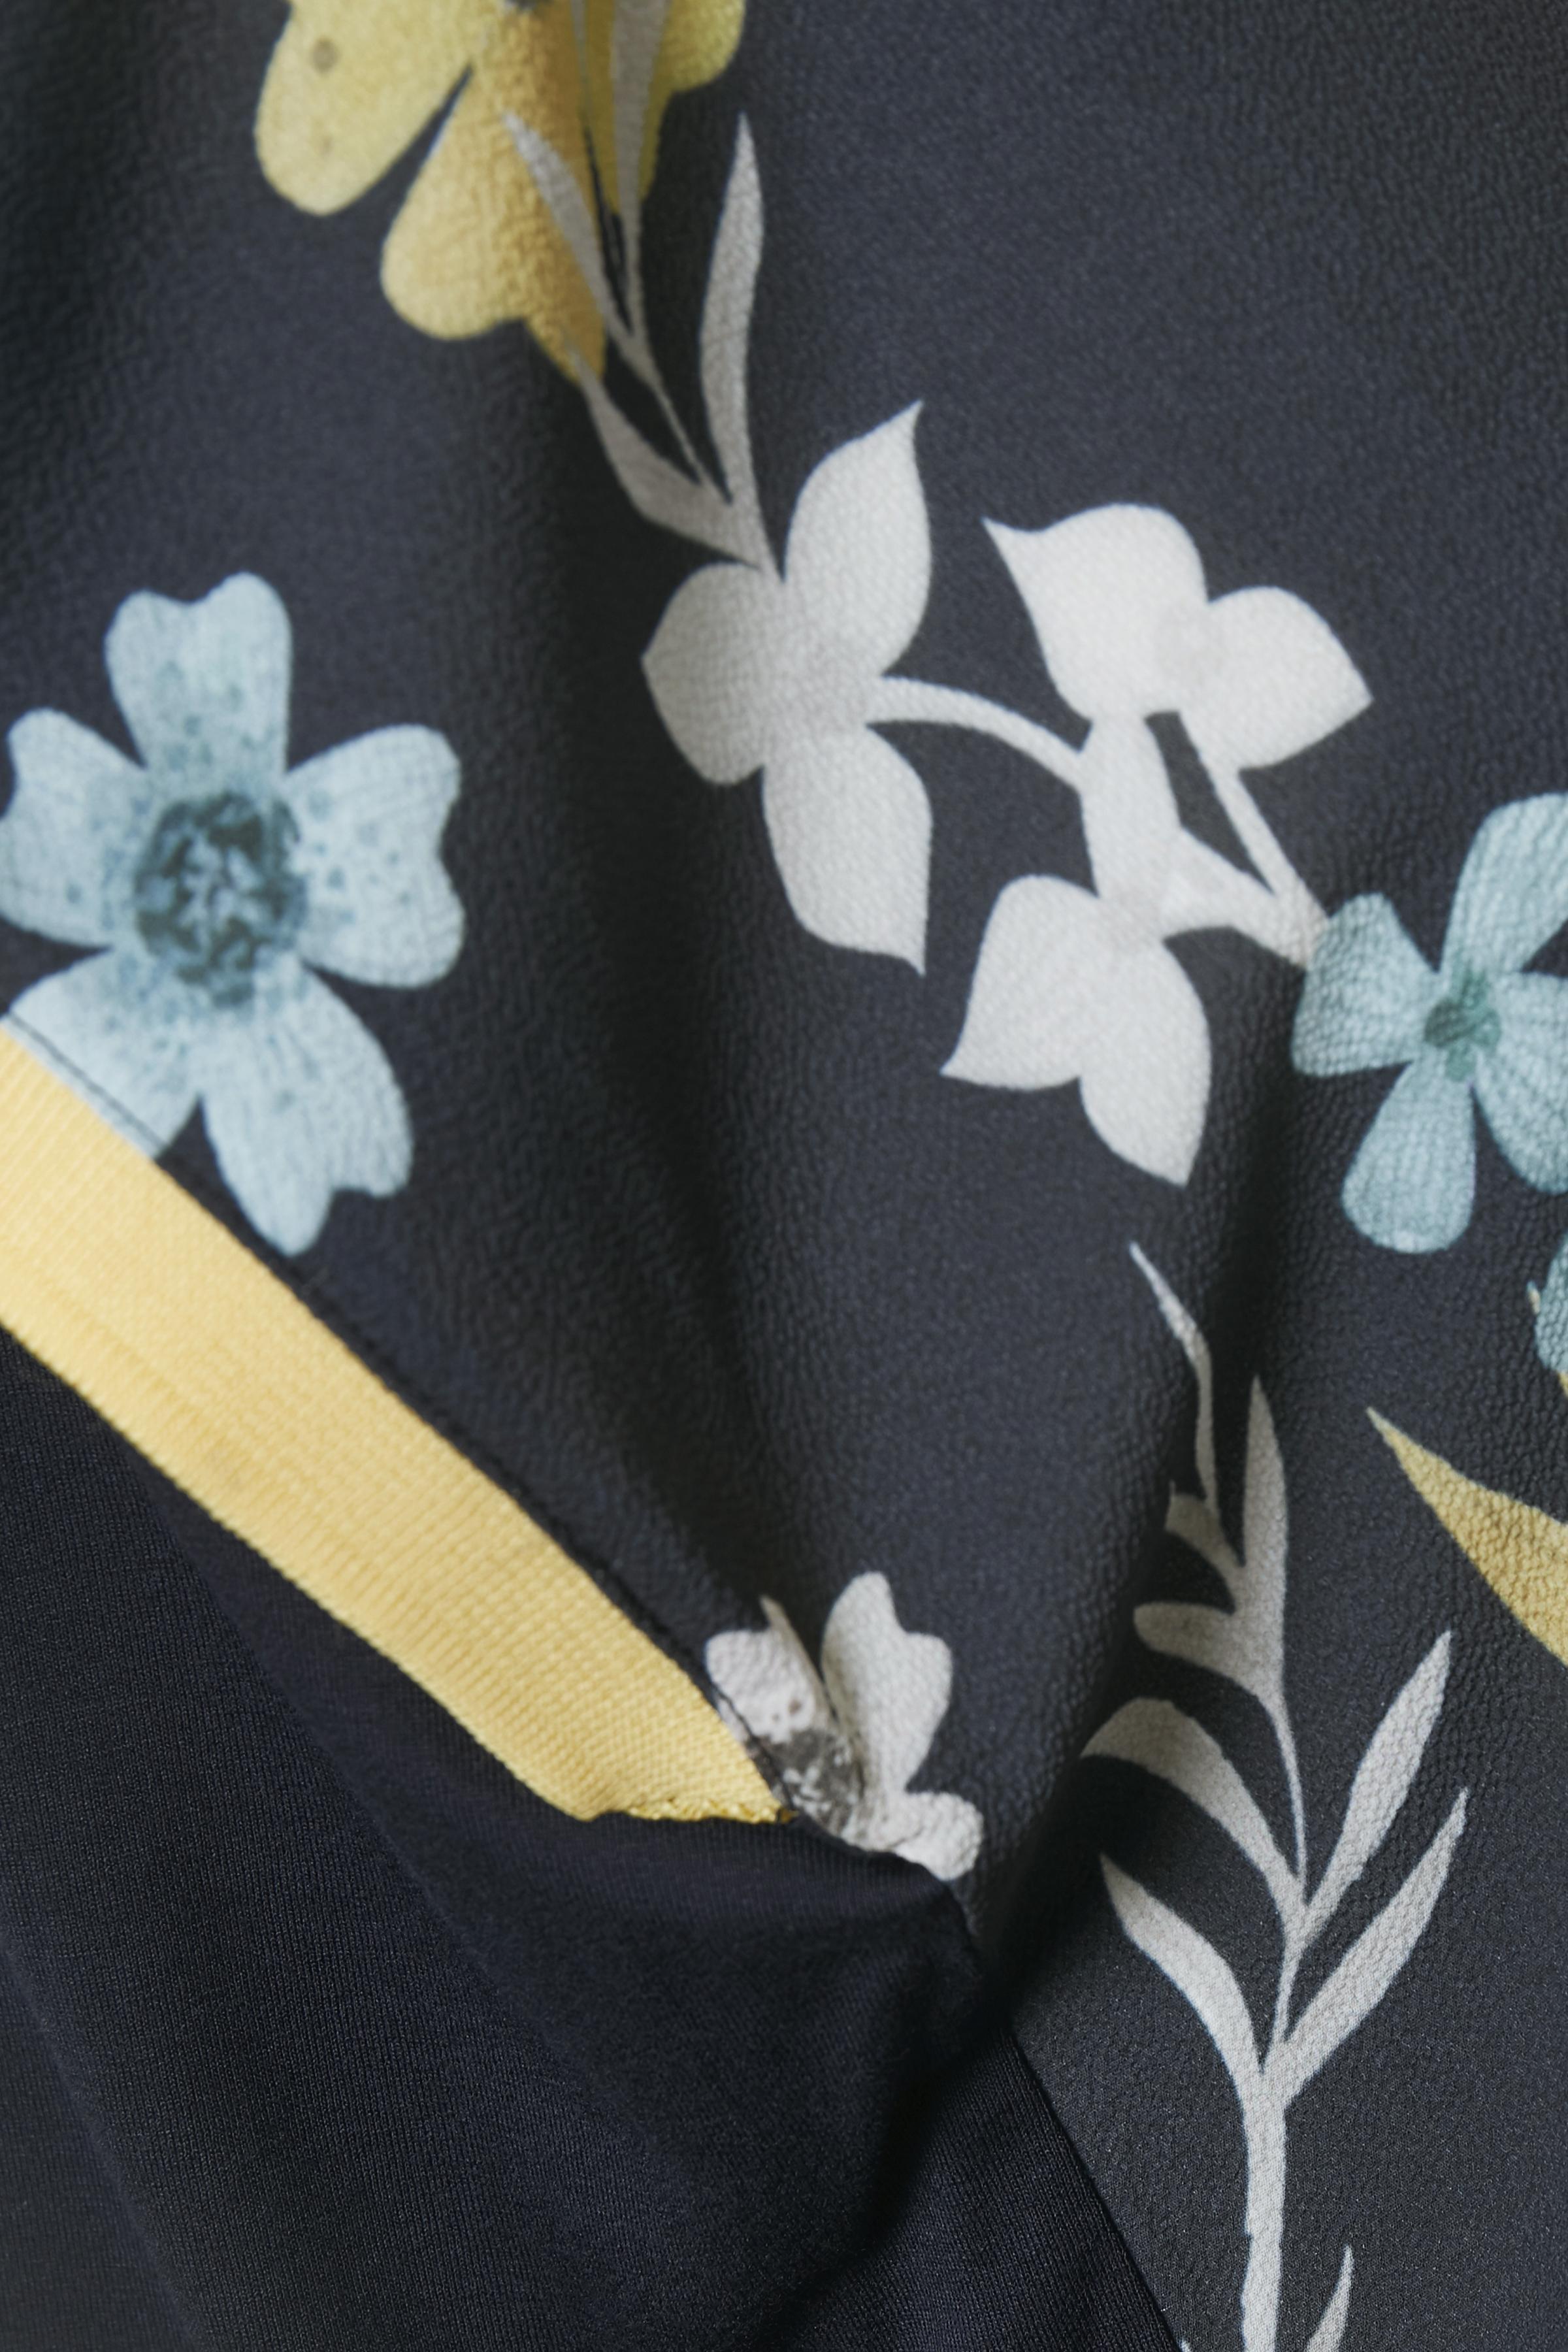 Marineblau/hellgelb Kurzarm-Bluse  von Bon'A Parte – Shoppen Sie Marineblau/hellgelb Kurzarm-Bluse  ab Gr. S-2XL hier